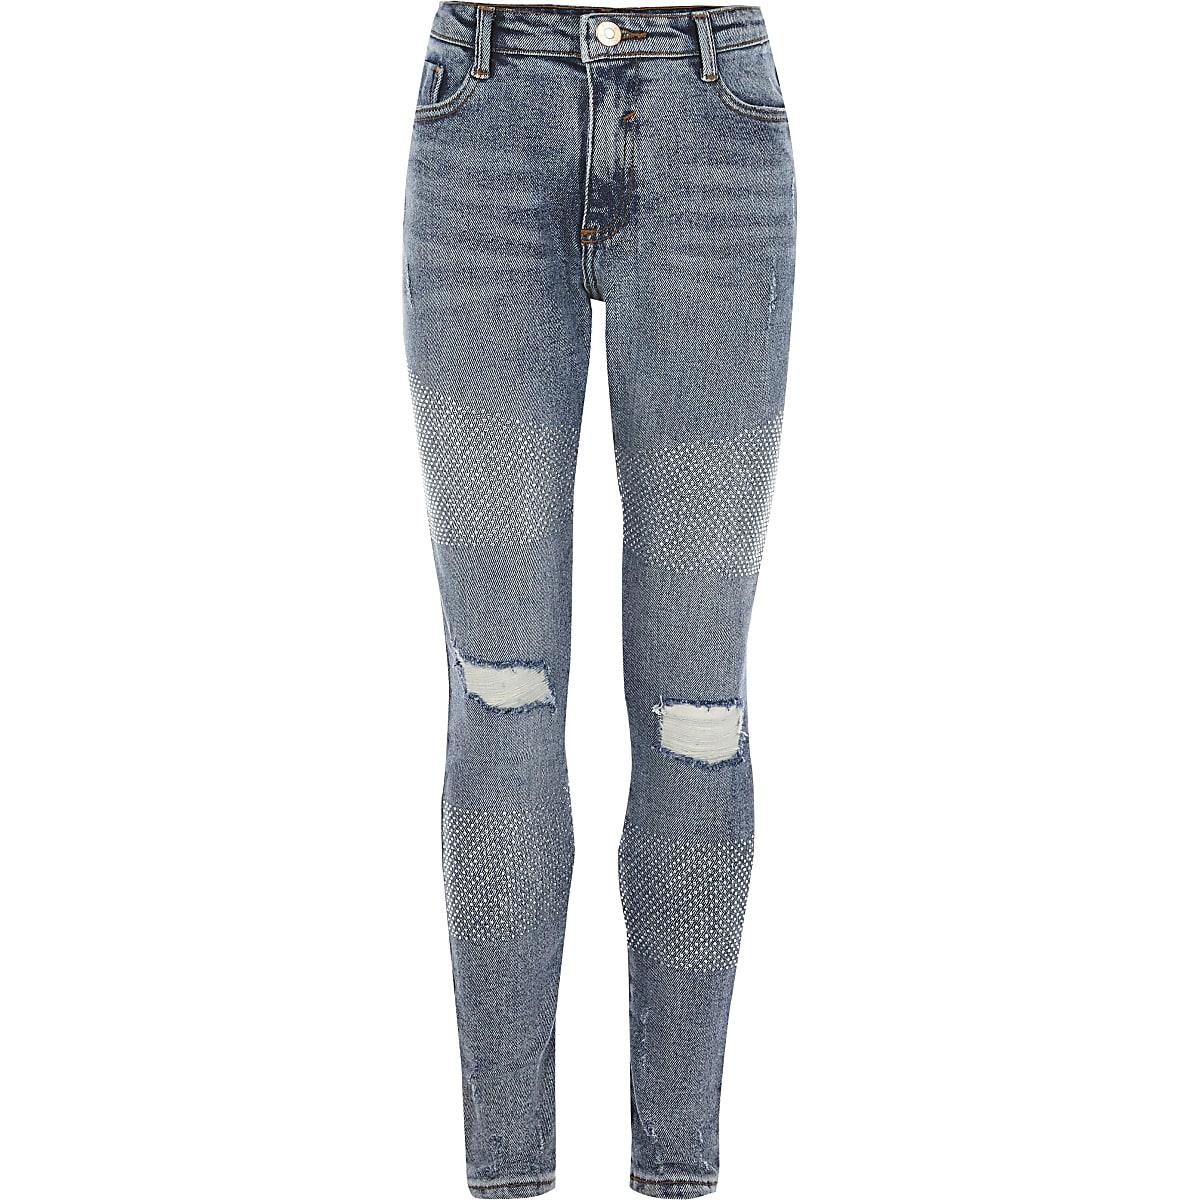 Girls blue diamante Amelie skinny jeans